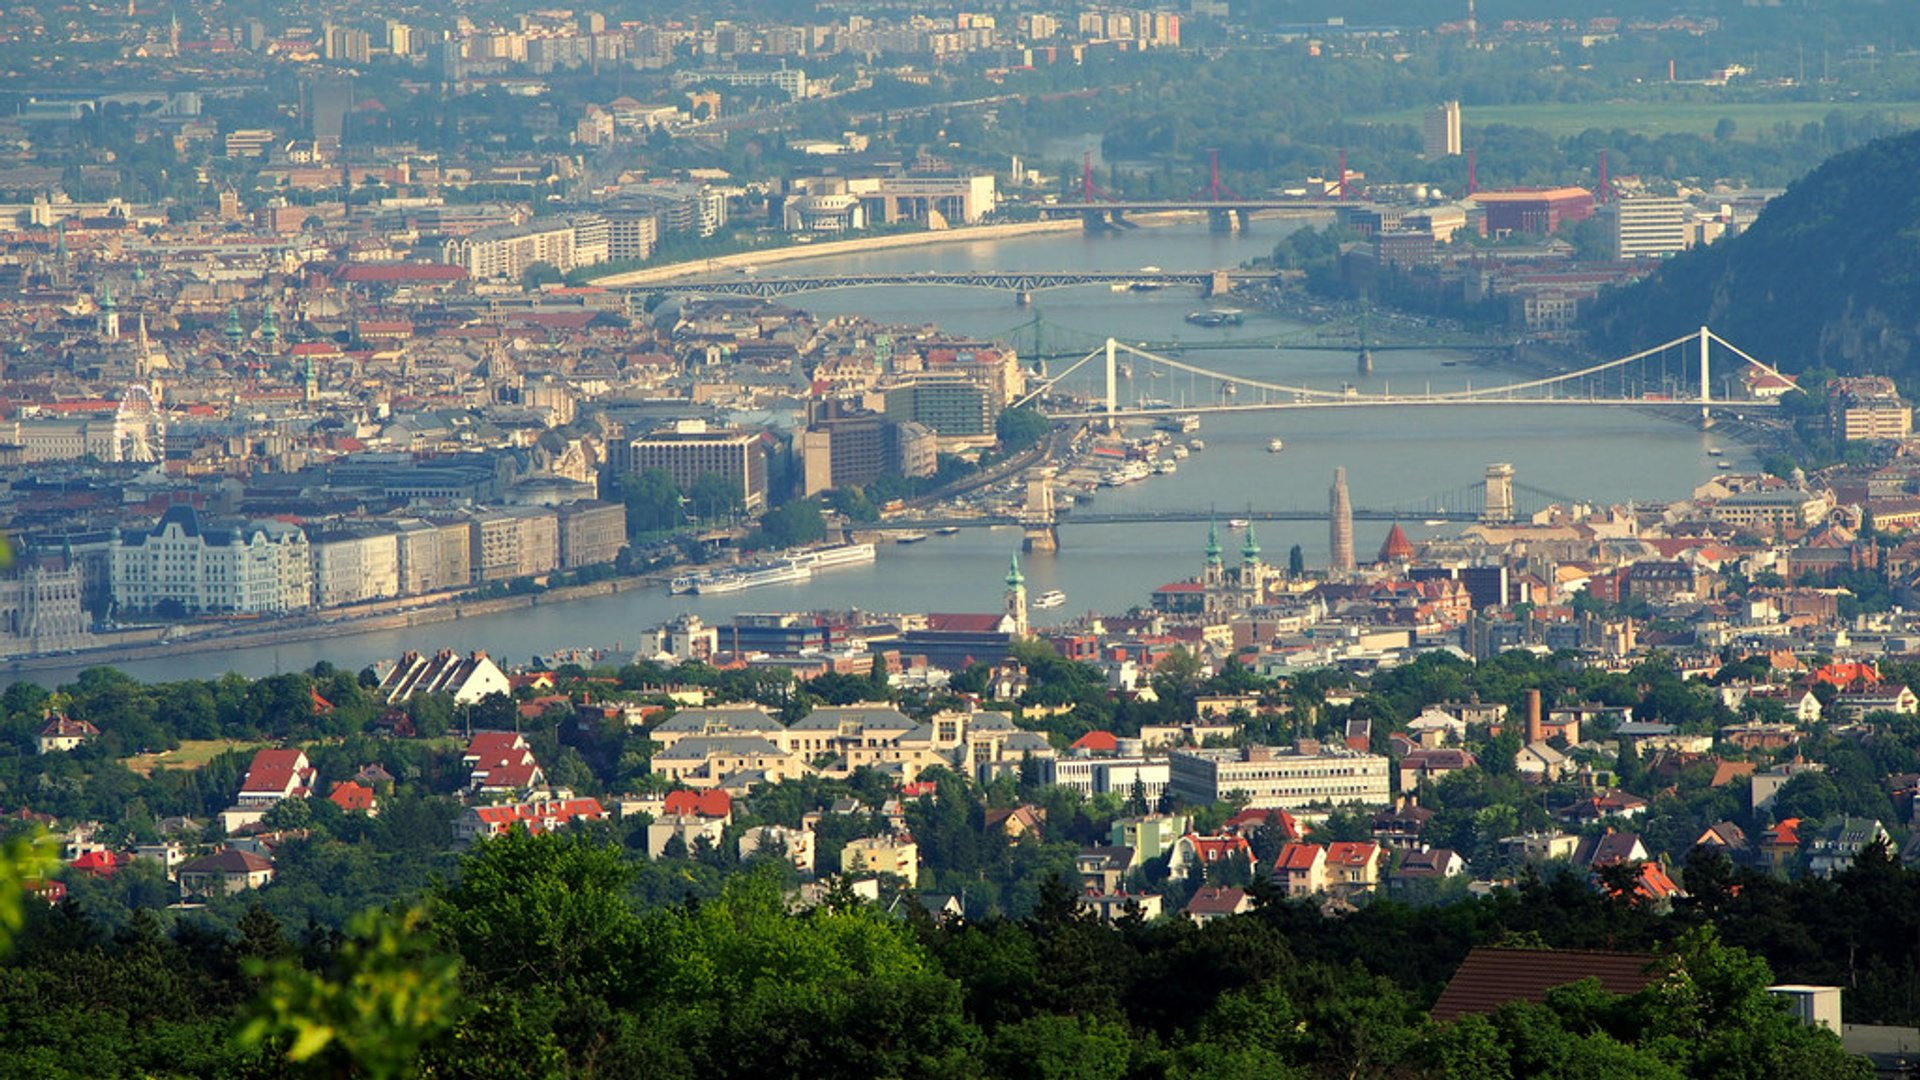 View of Budapest from Hármashatár-hegy 2020